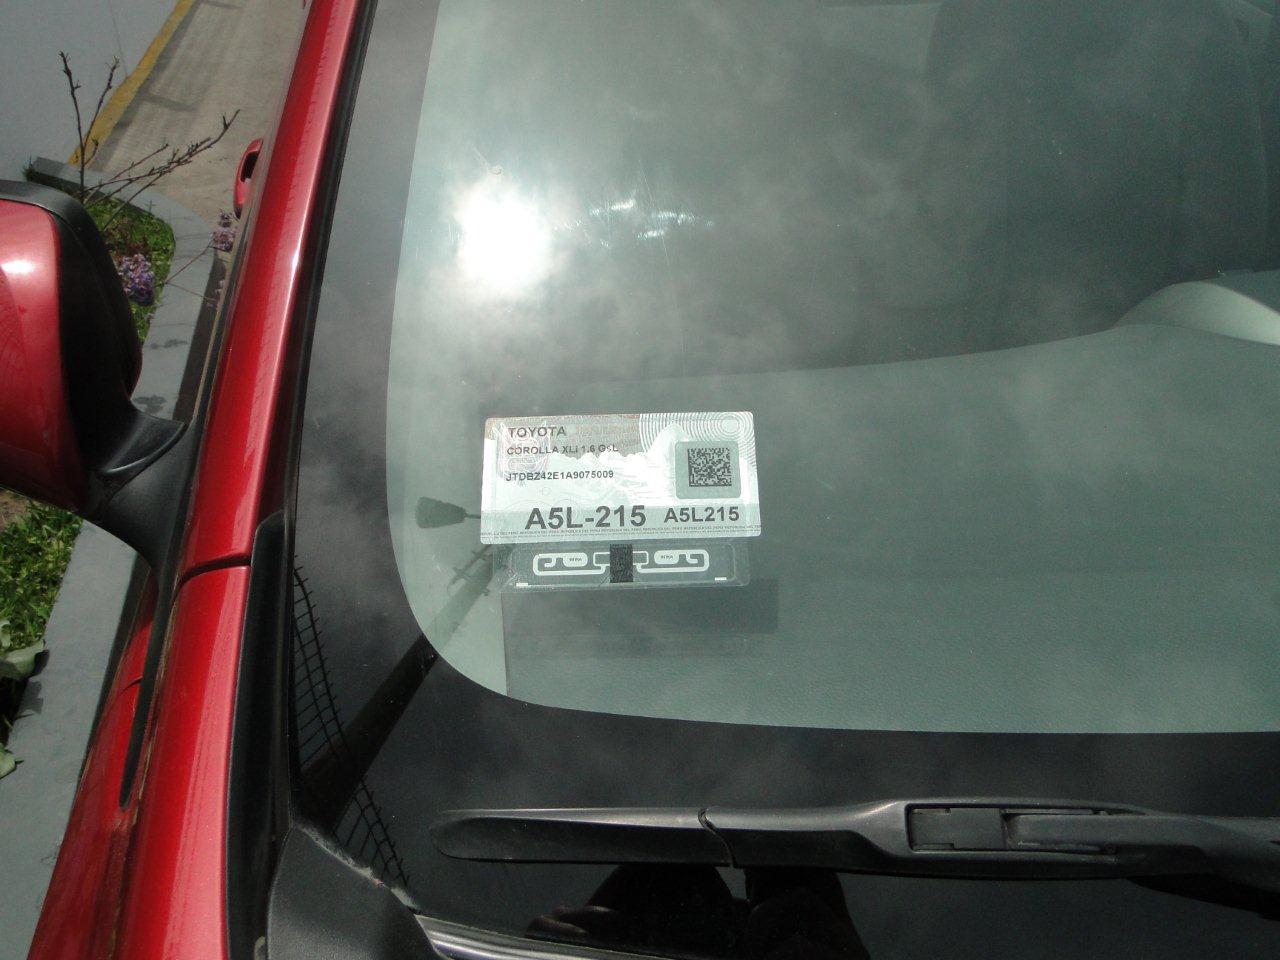 Tercera placa una radiograf a vehicular por herbert for Donde venden vinilos para pared